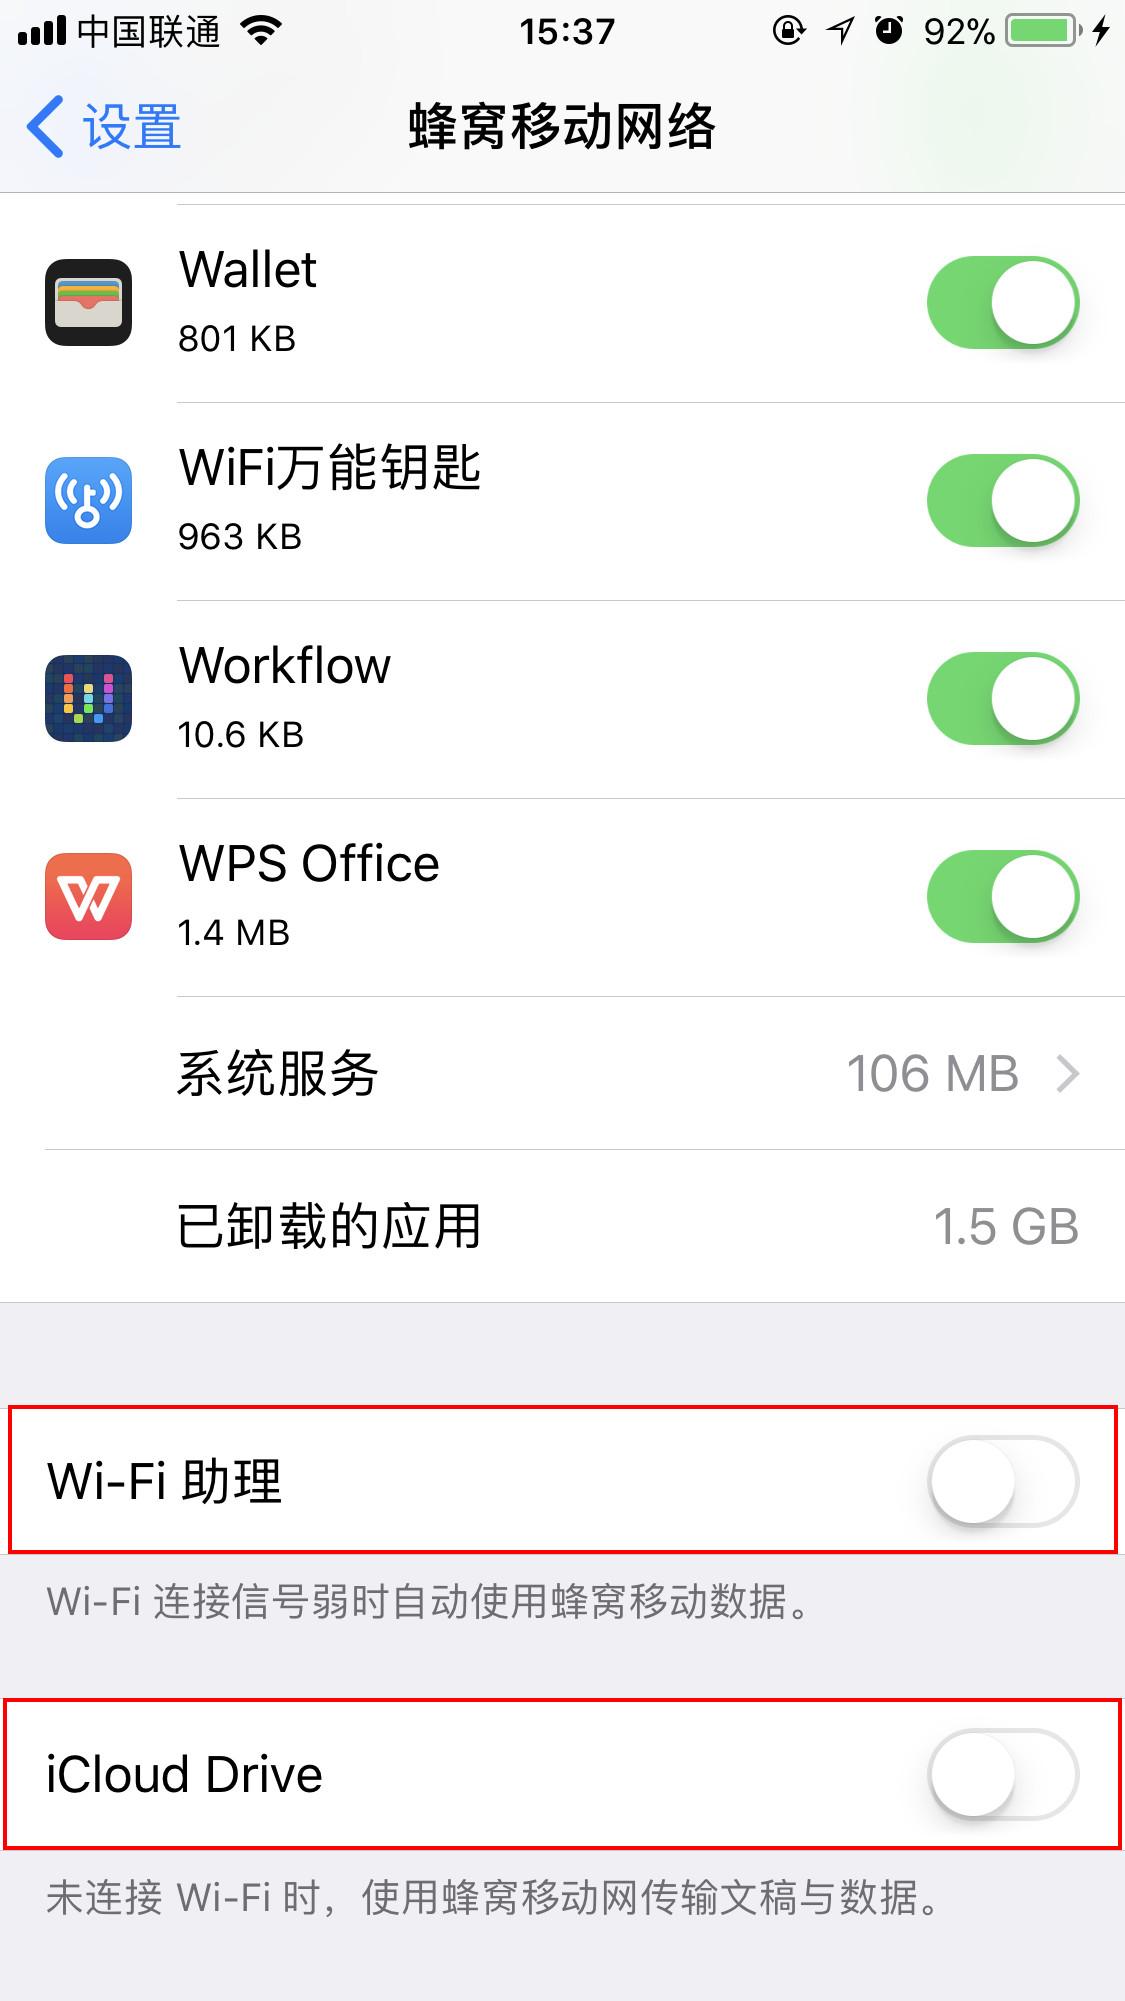 iPhone 连接 WiFi 后需要断开数据连接吗?